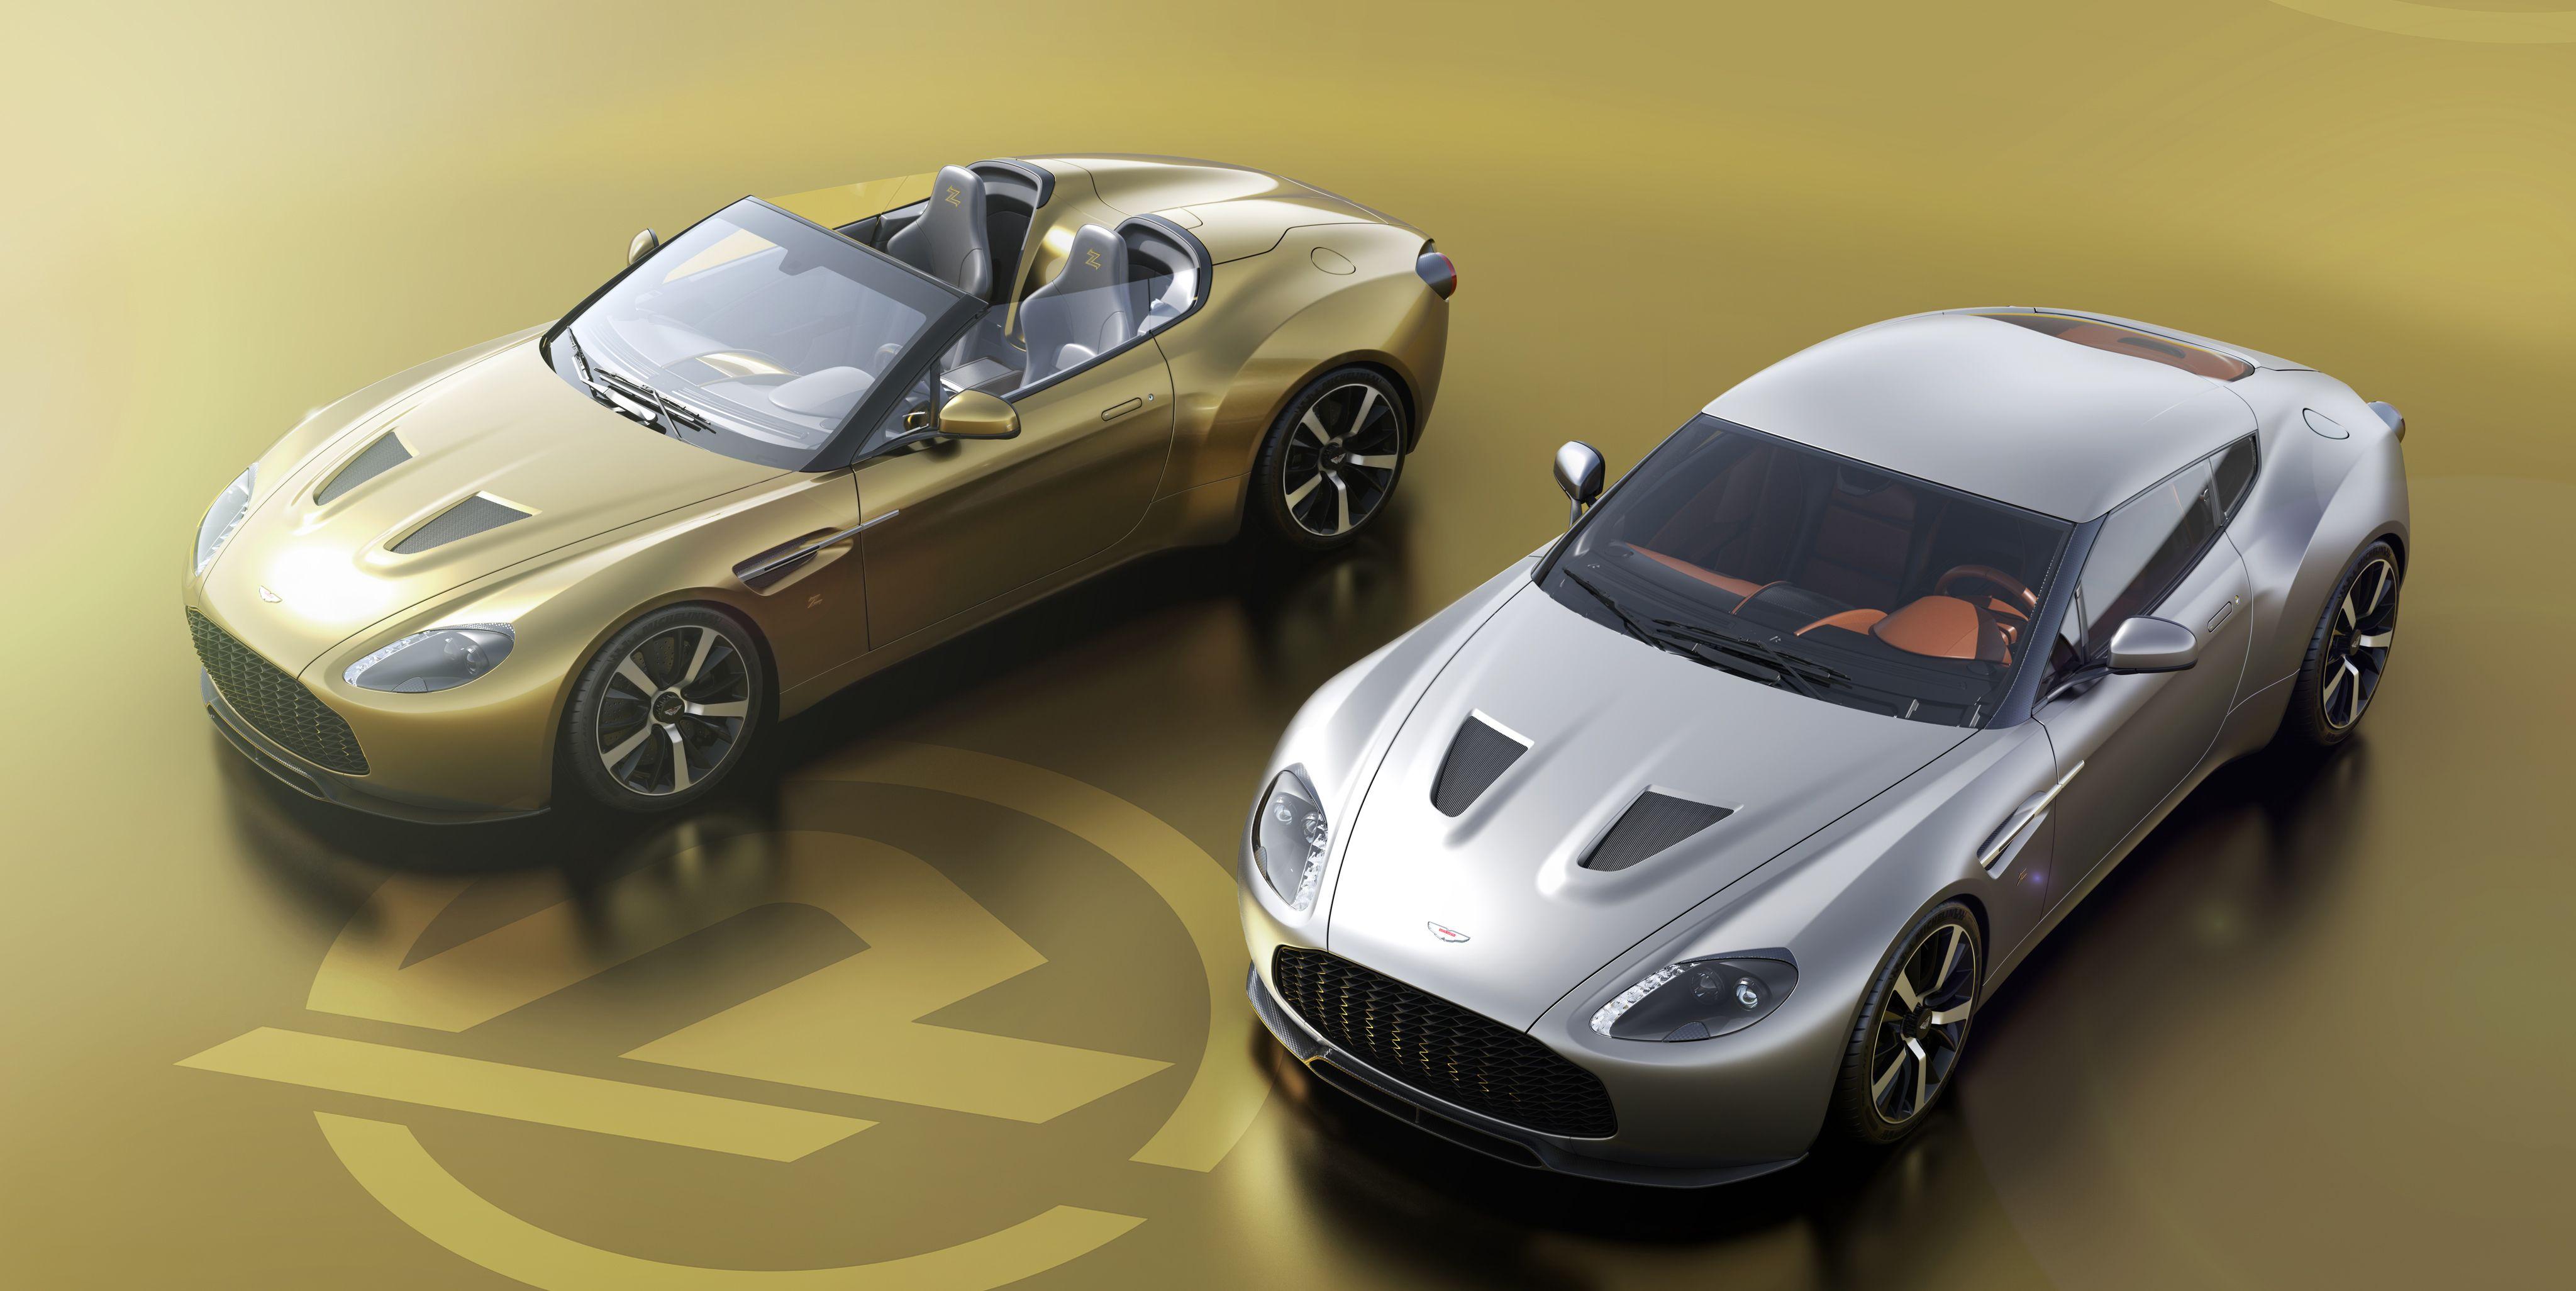 Aston Martin Vantage Zagato V12 Coupe, Speedster Pair Revealed